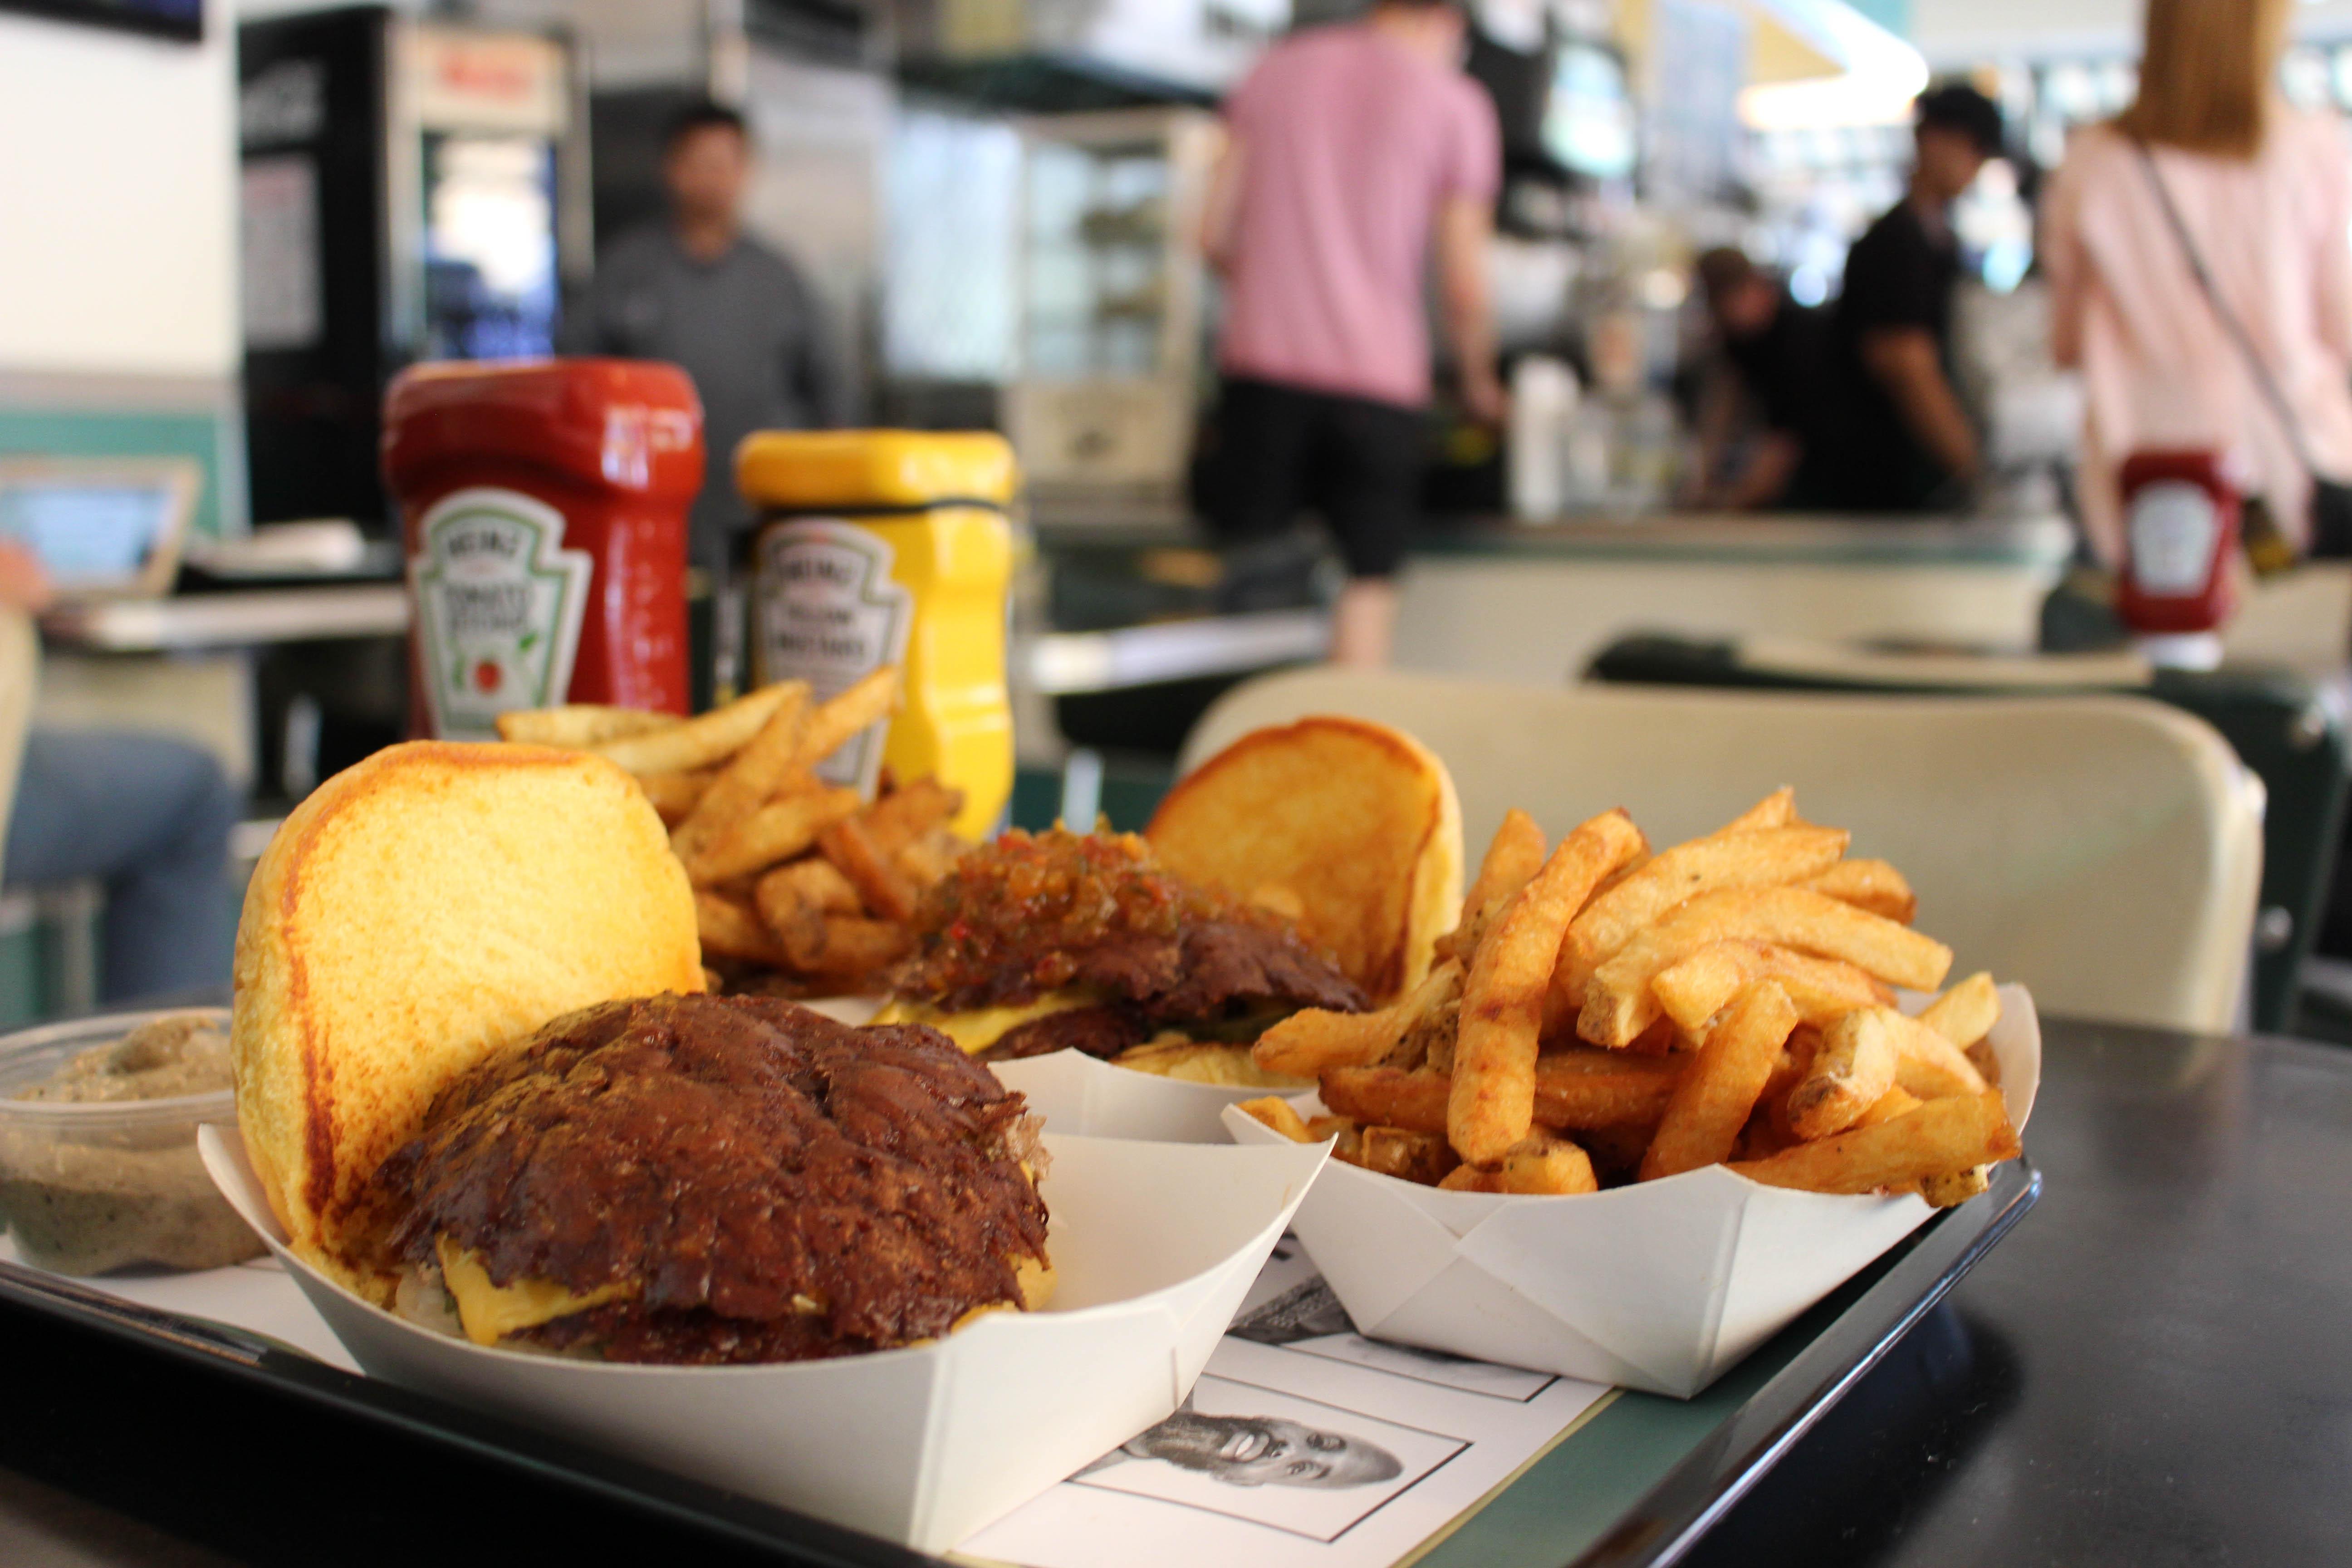 Gli hamburger del Harlem Shake. Foto di Simone Somekh (2017).